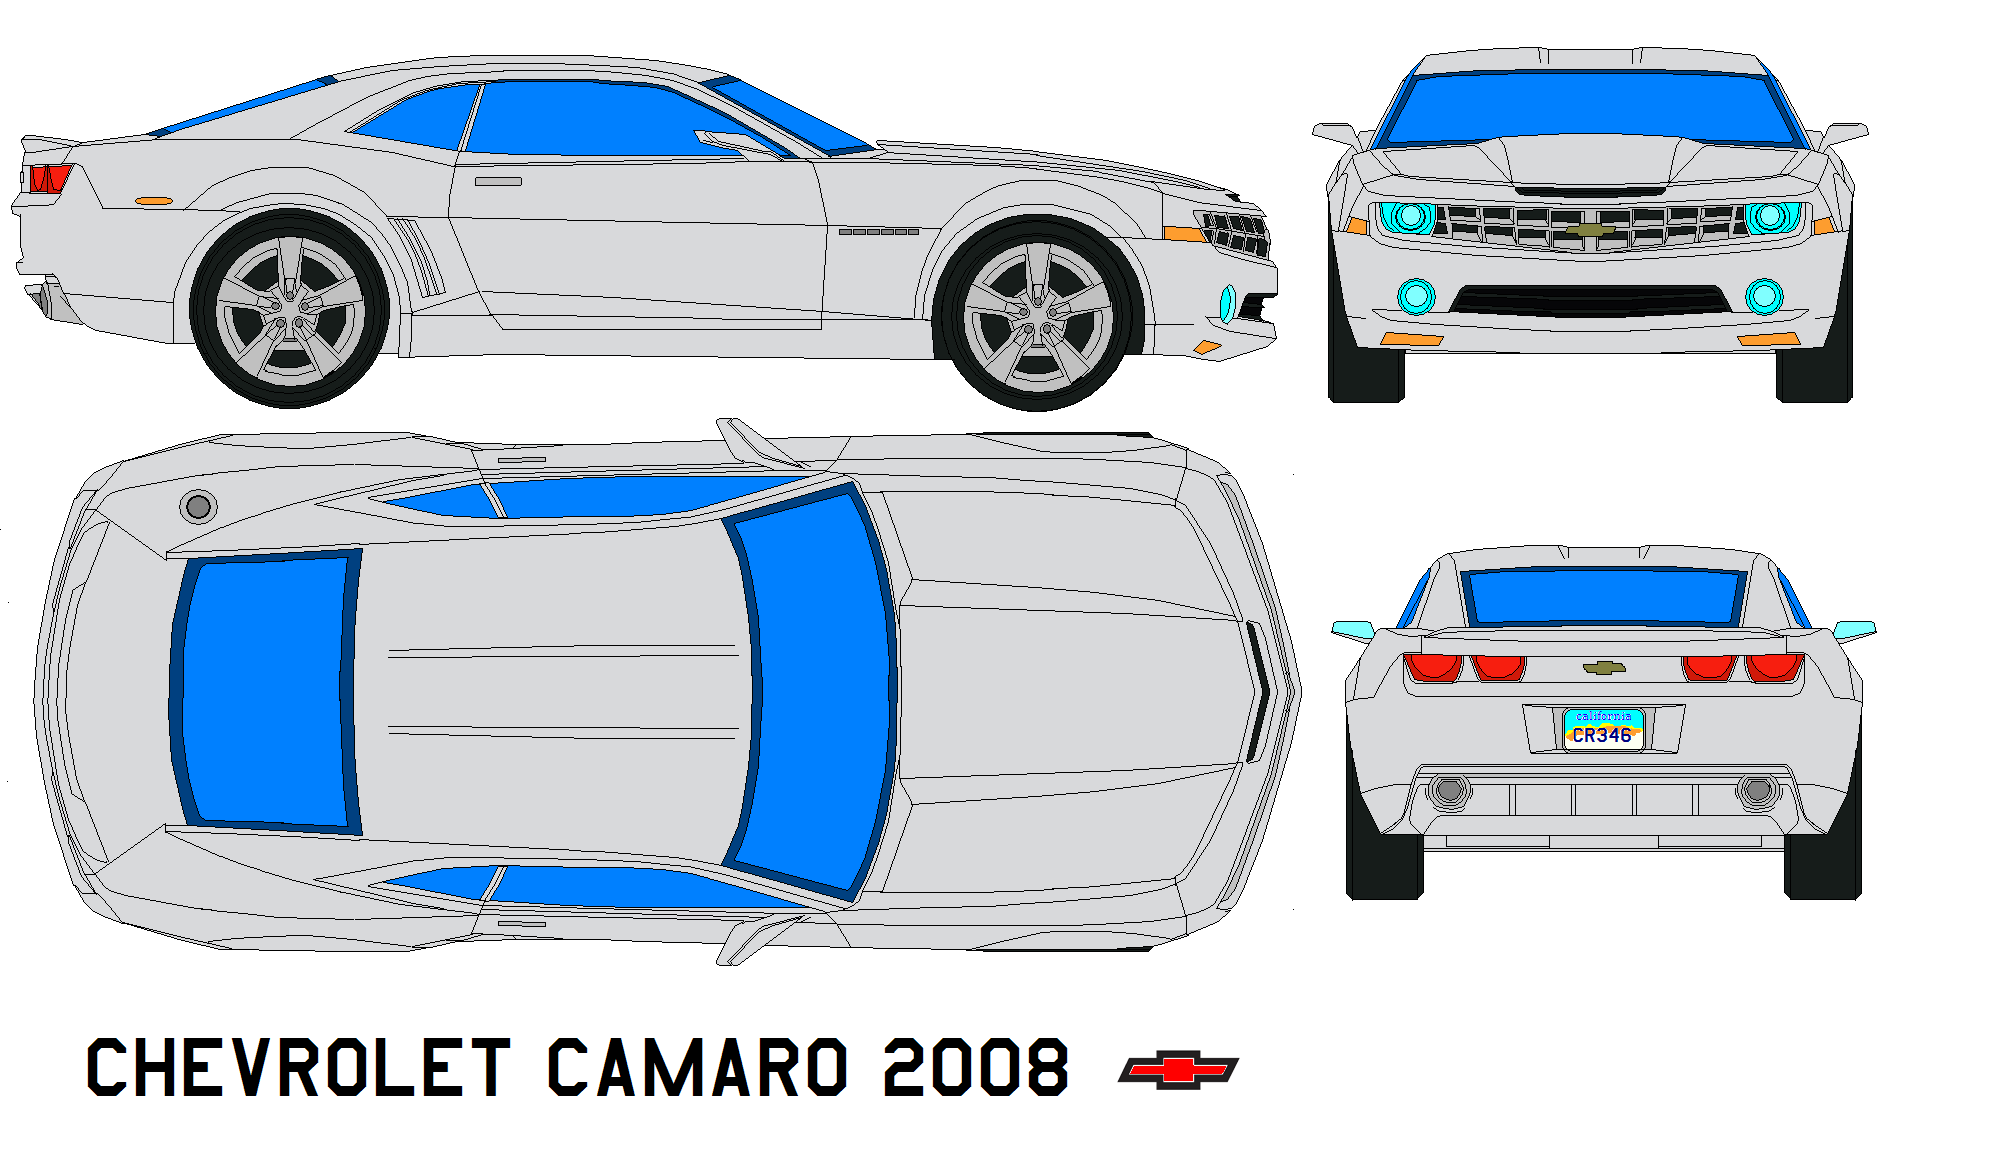 Chevrolet Camaro 2008 By Bagera3005 On Deviantart